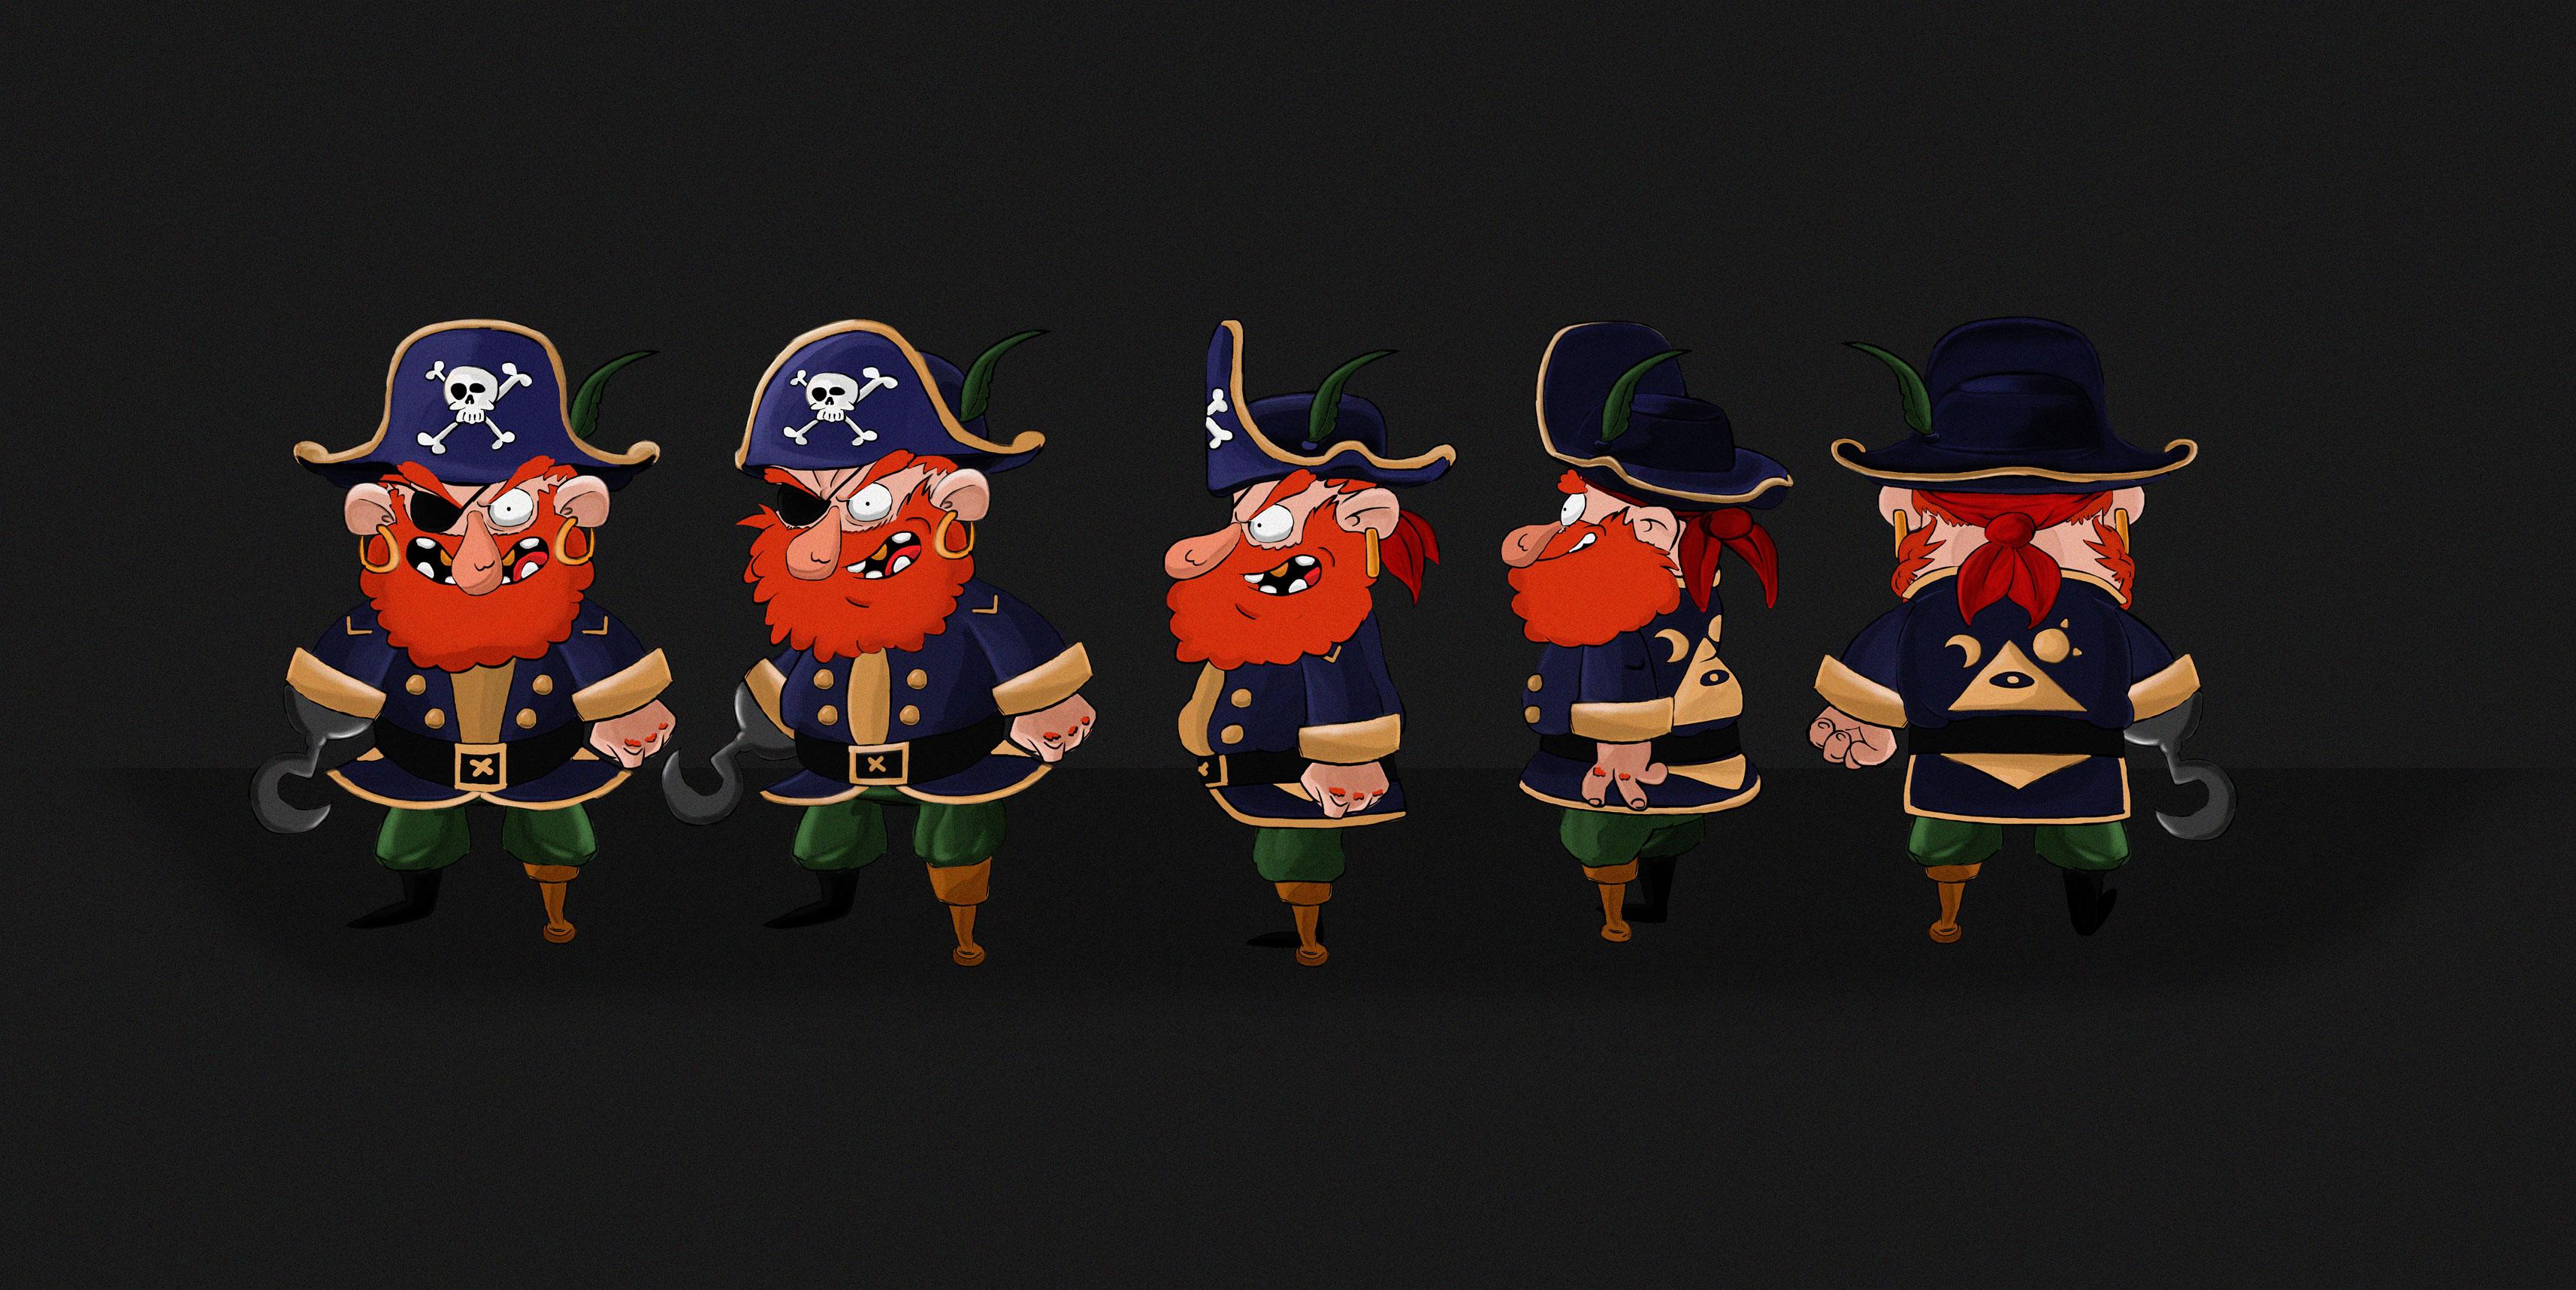 Avast Ye Matey - Conceptual Pirate